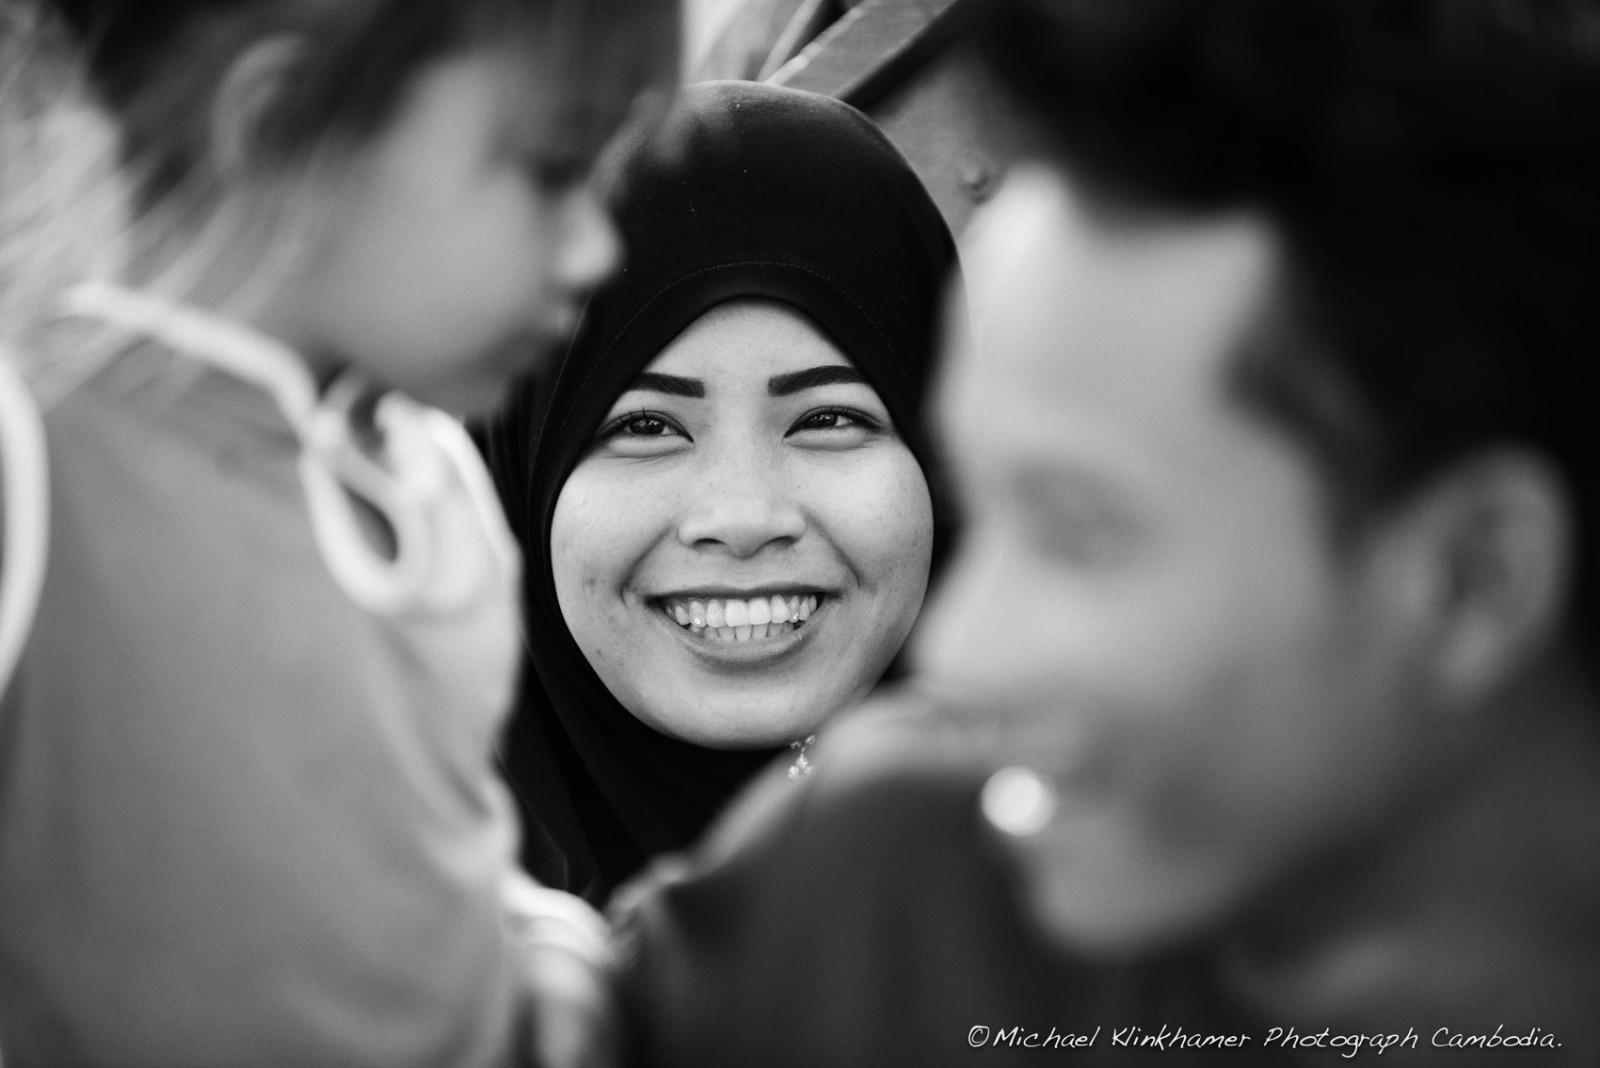 Cham family smiling